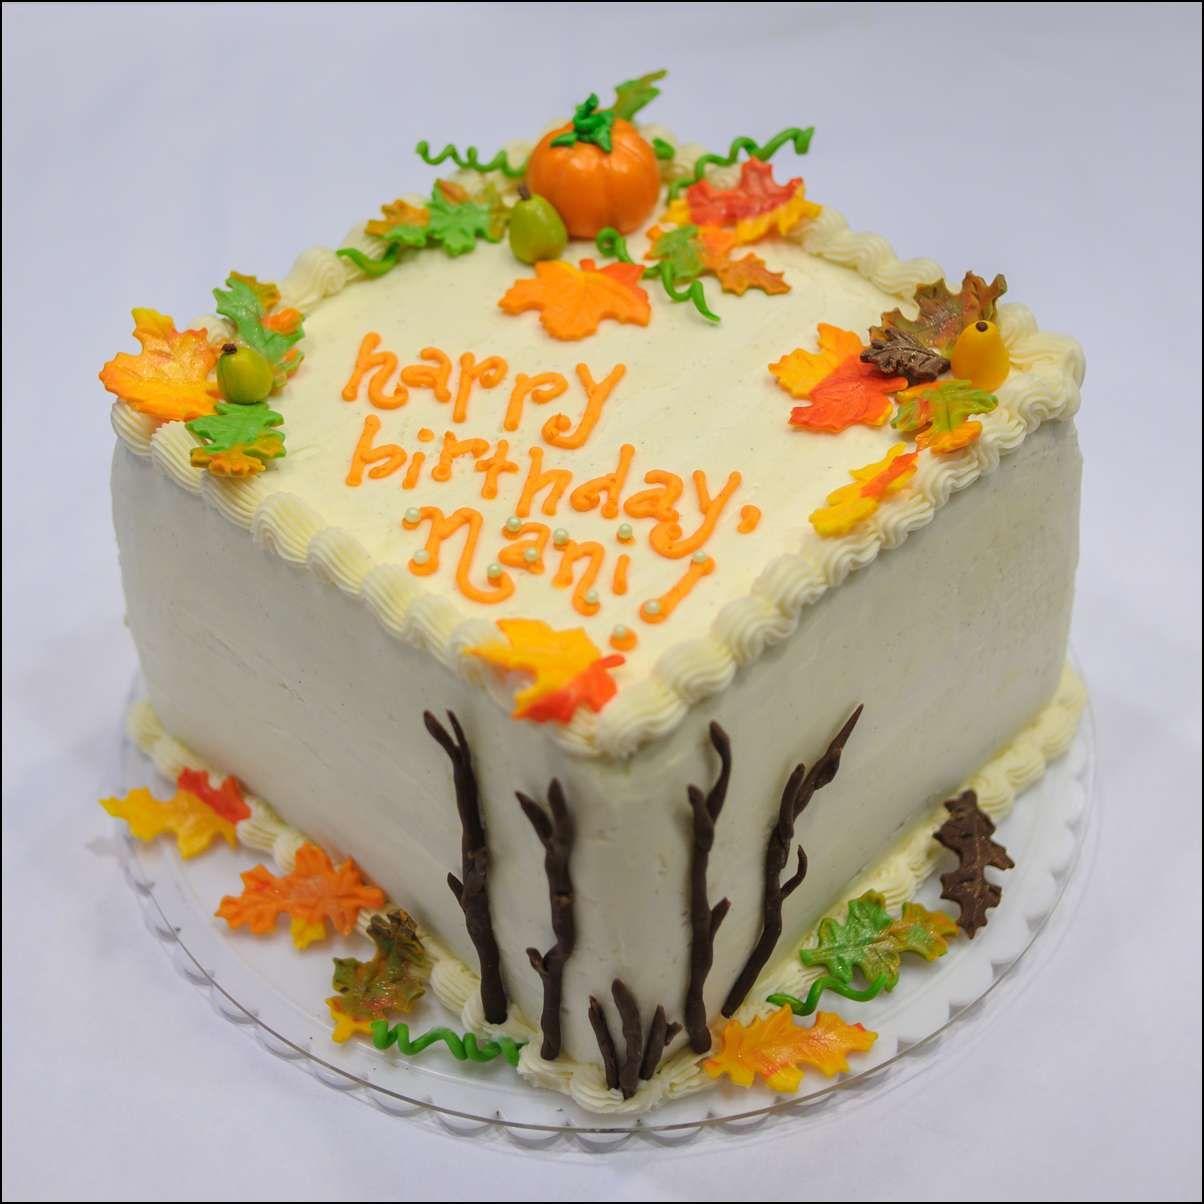 Strange Happy Birthday Cakes For Adults With A Fall Theme Happy Birthday Funny Birthday Cards Online Aboleapandamsfinfo